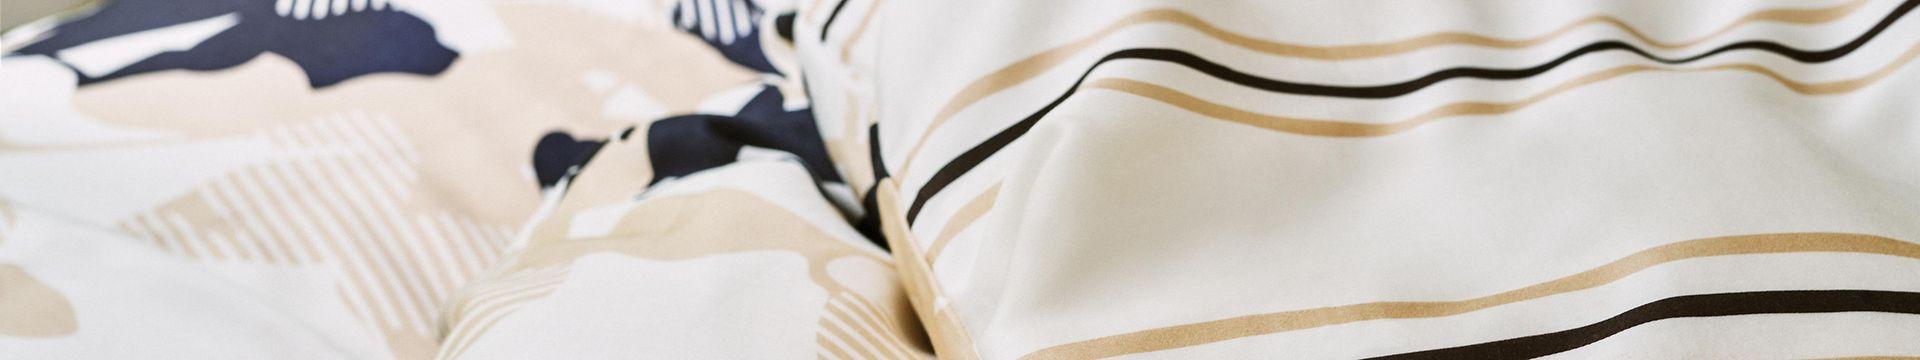 102021 - Home - Bedding - TC Banner (1)